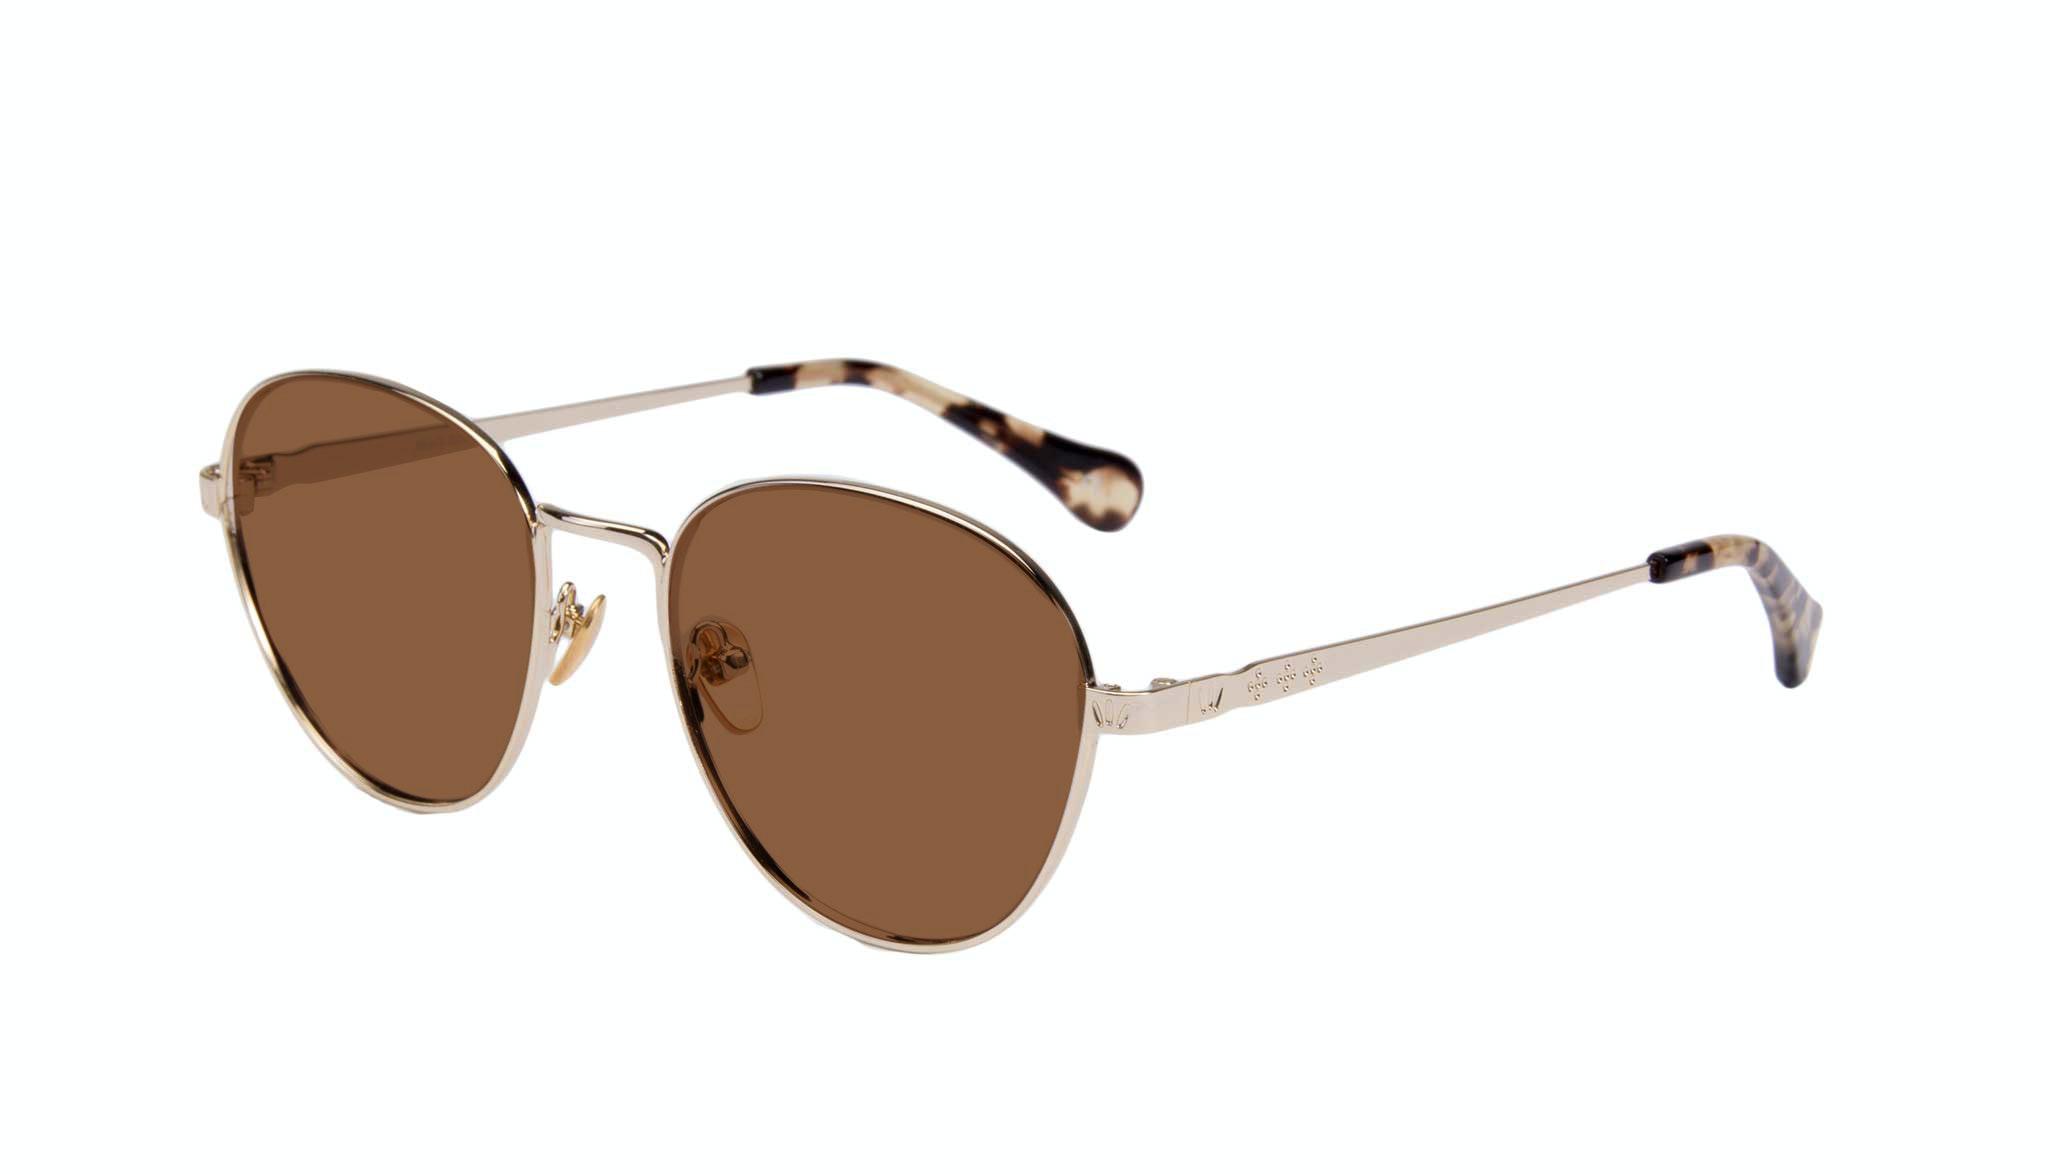 Affordable Fashion Glasses Round Sunglasses Women Brace Gold Tilt